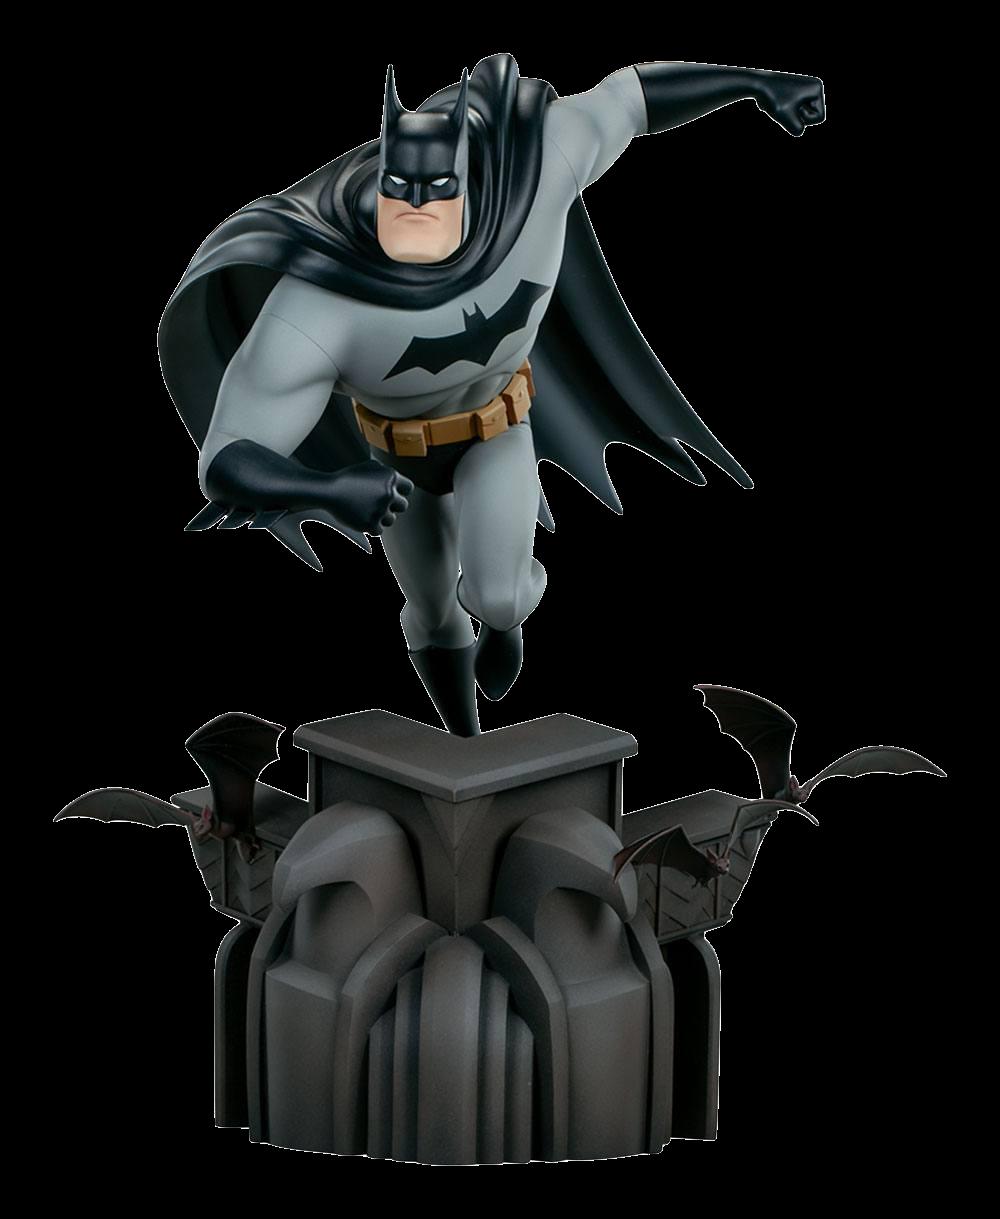 sideshow-dc-batman-animated-series-batman-statue-toyslife